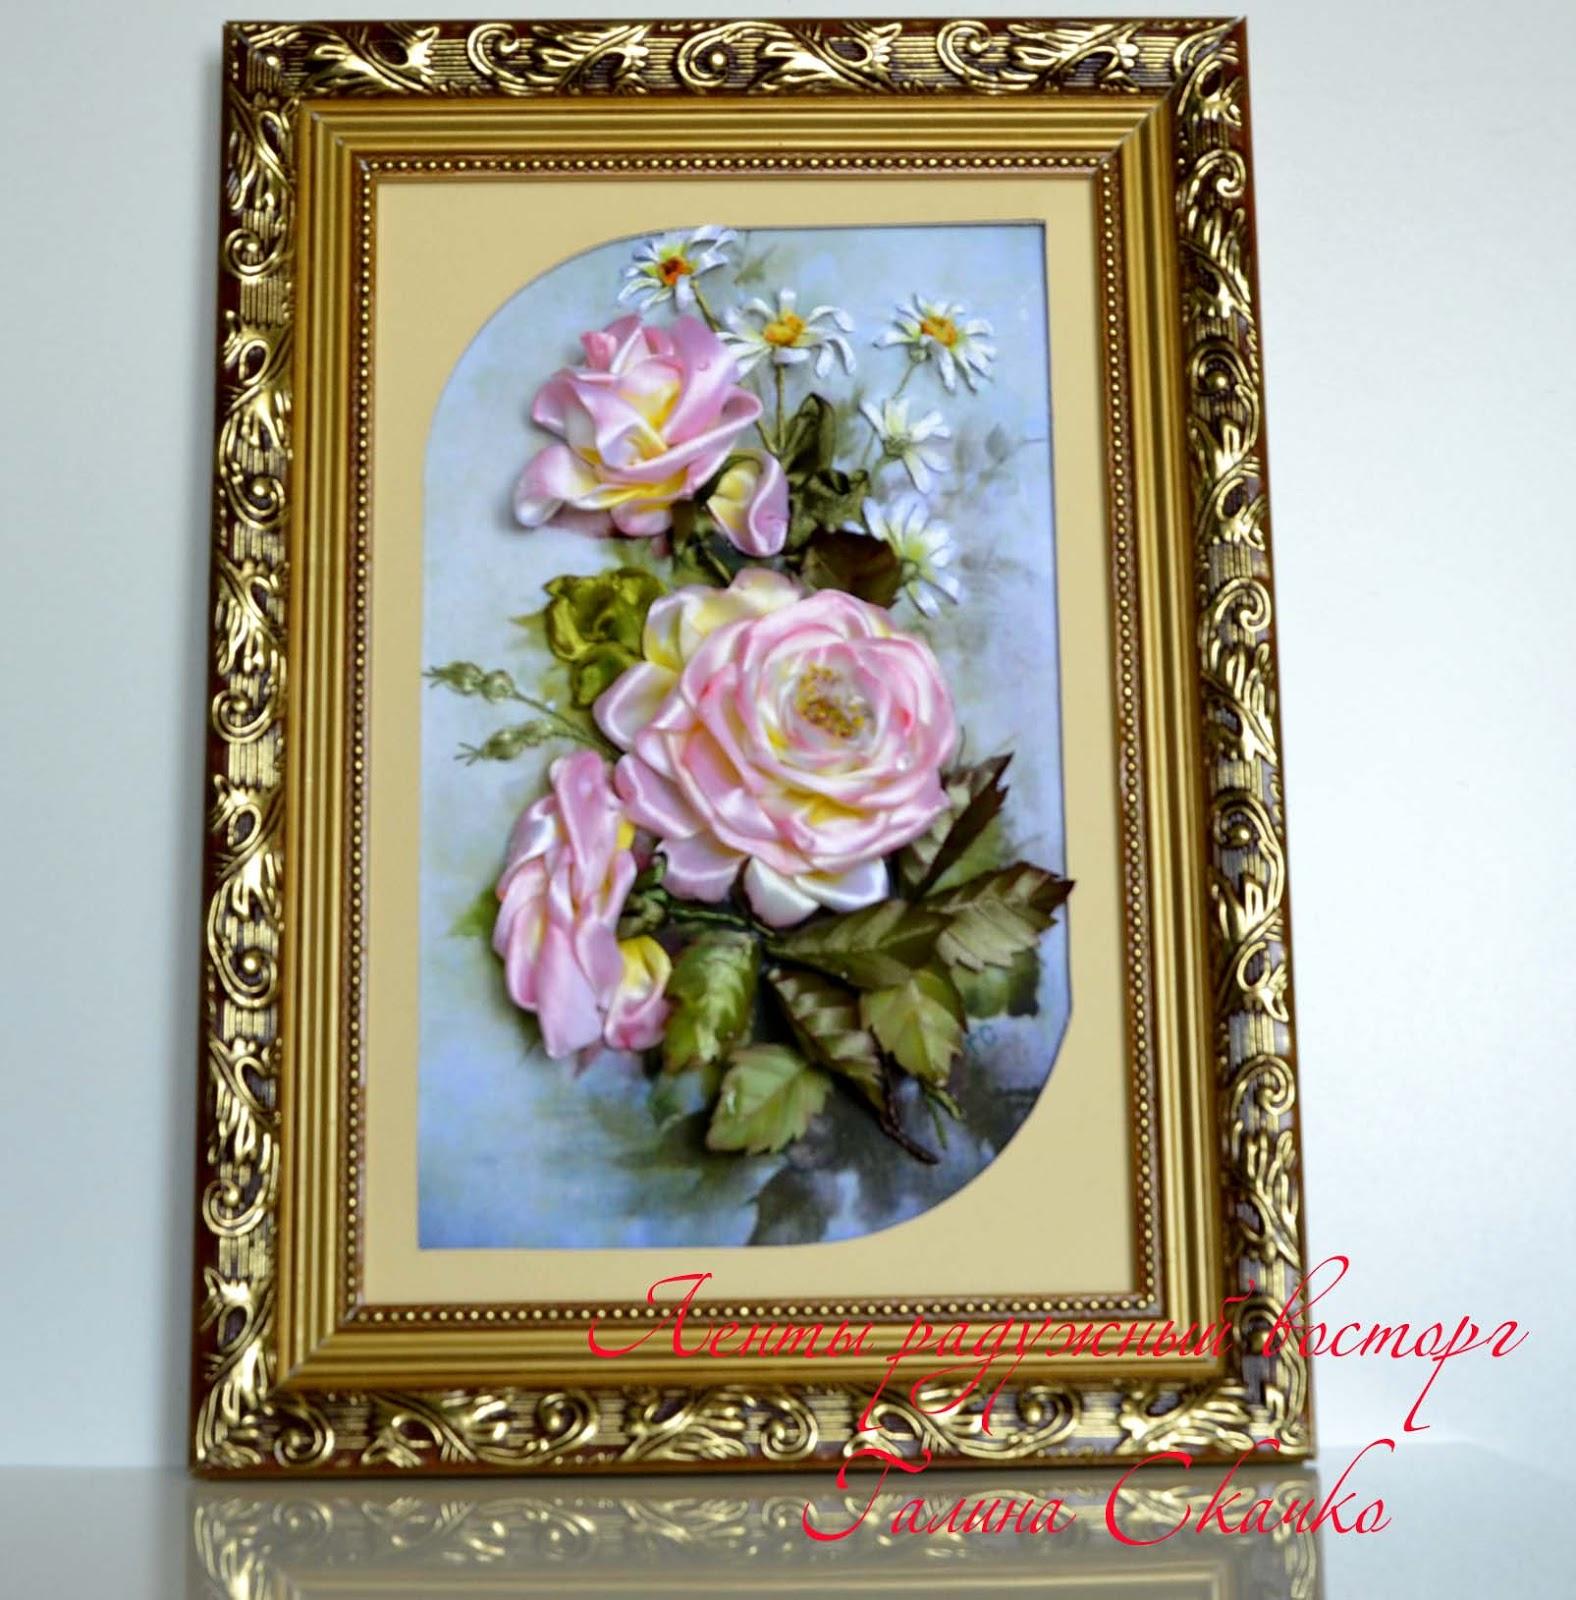 вышивка лентами, вышитые лентами розы, картины